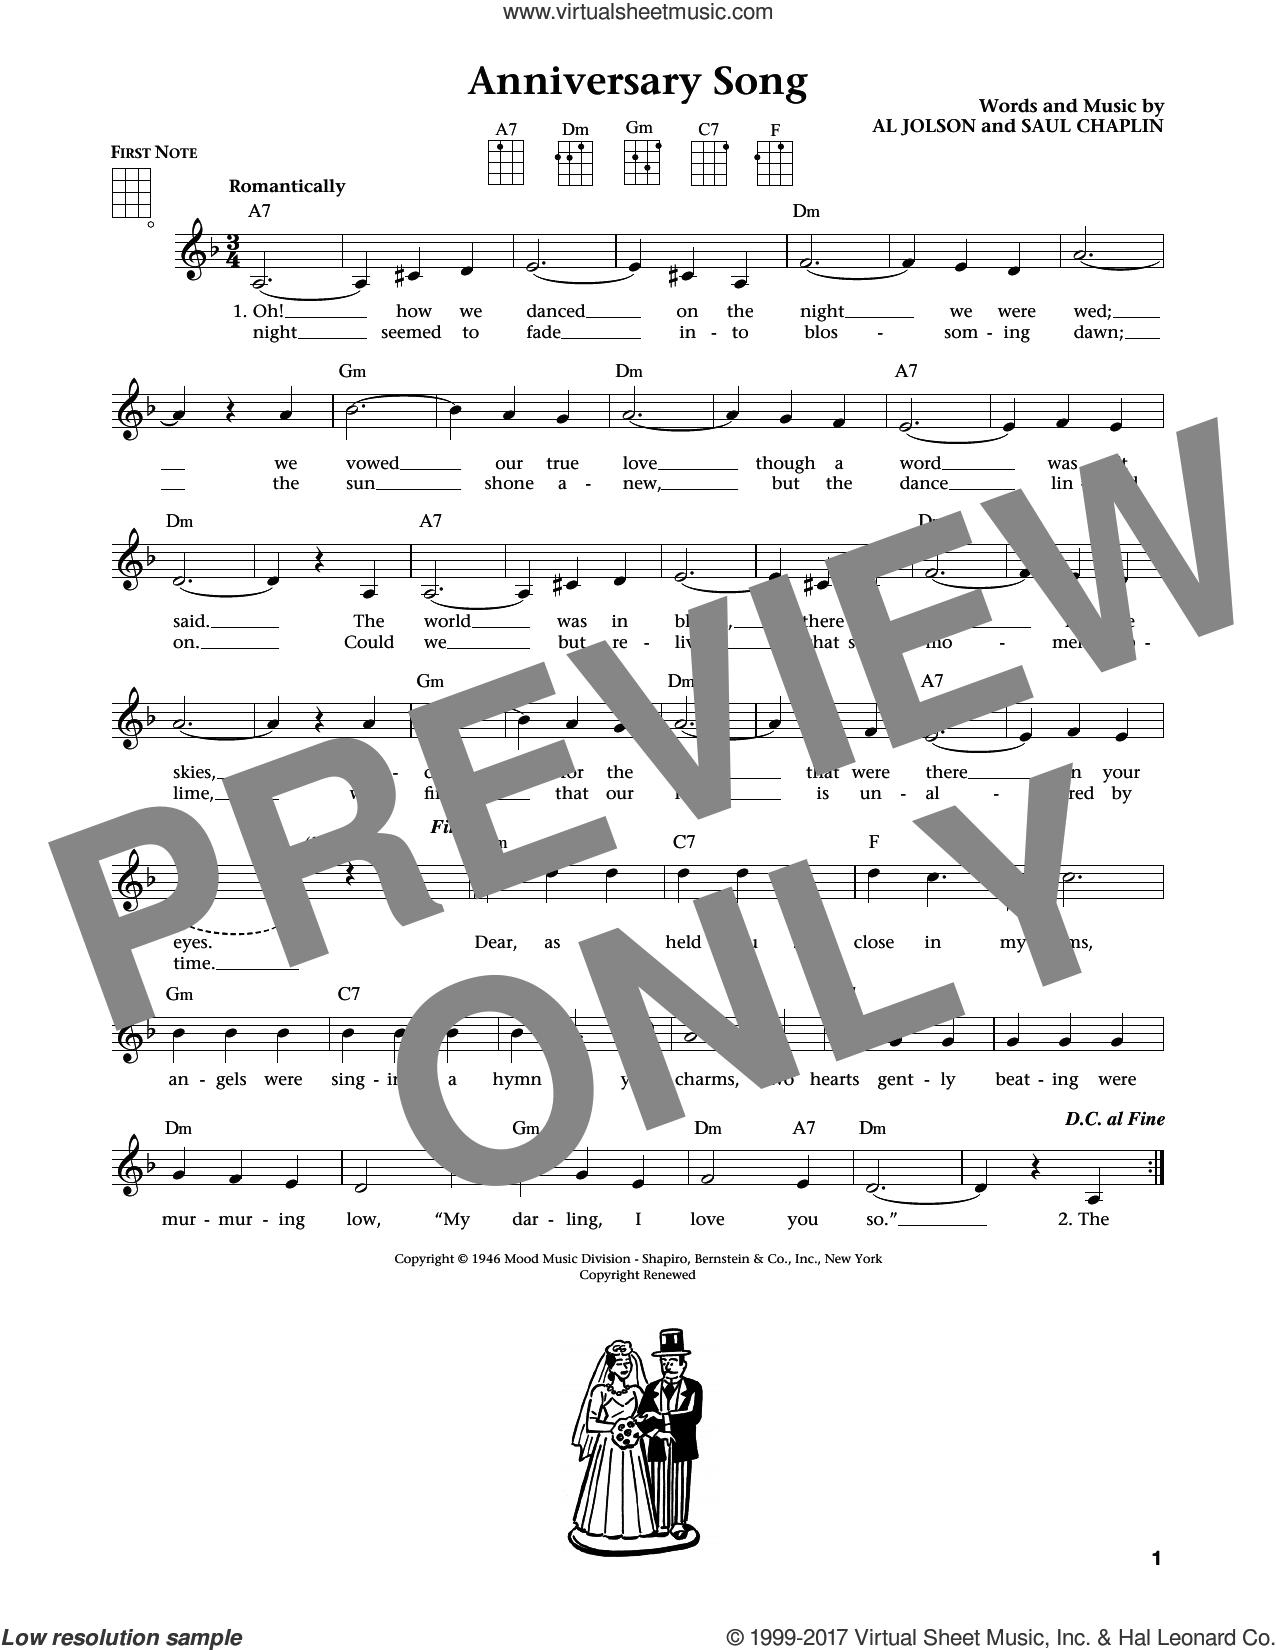 Anniversary Song (from The Daily Ukulele) (arr. Liz and Jim Beloff) sheet music for ukulele by Al Jolson, Jim Beloff, Liz Beloff and Saul Chaplin, intermediate skill level